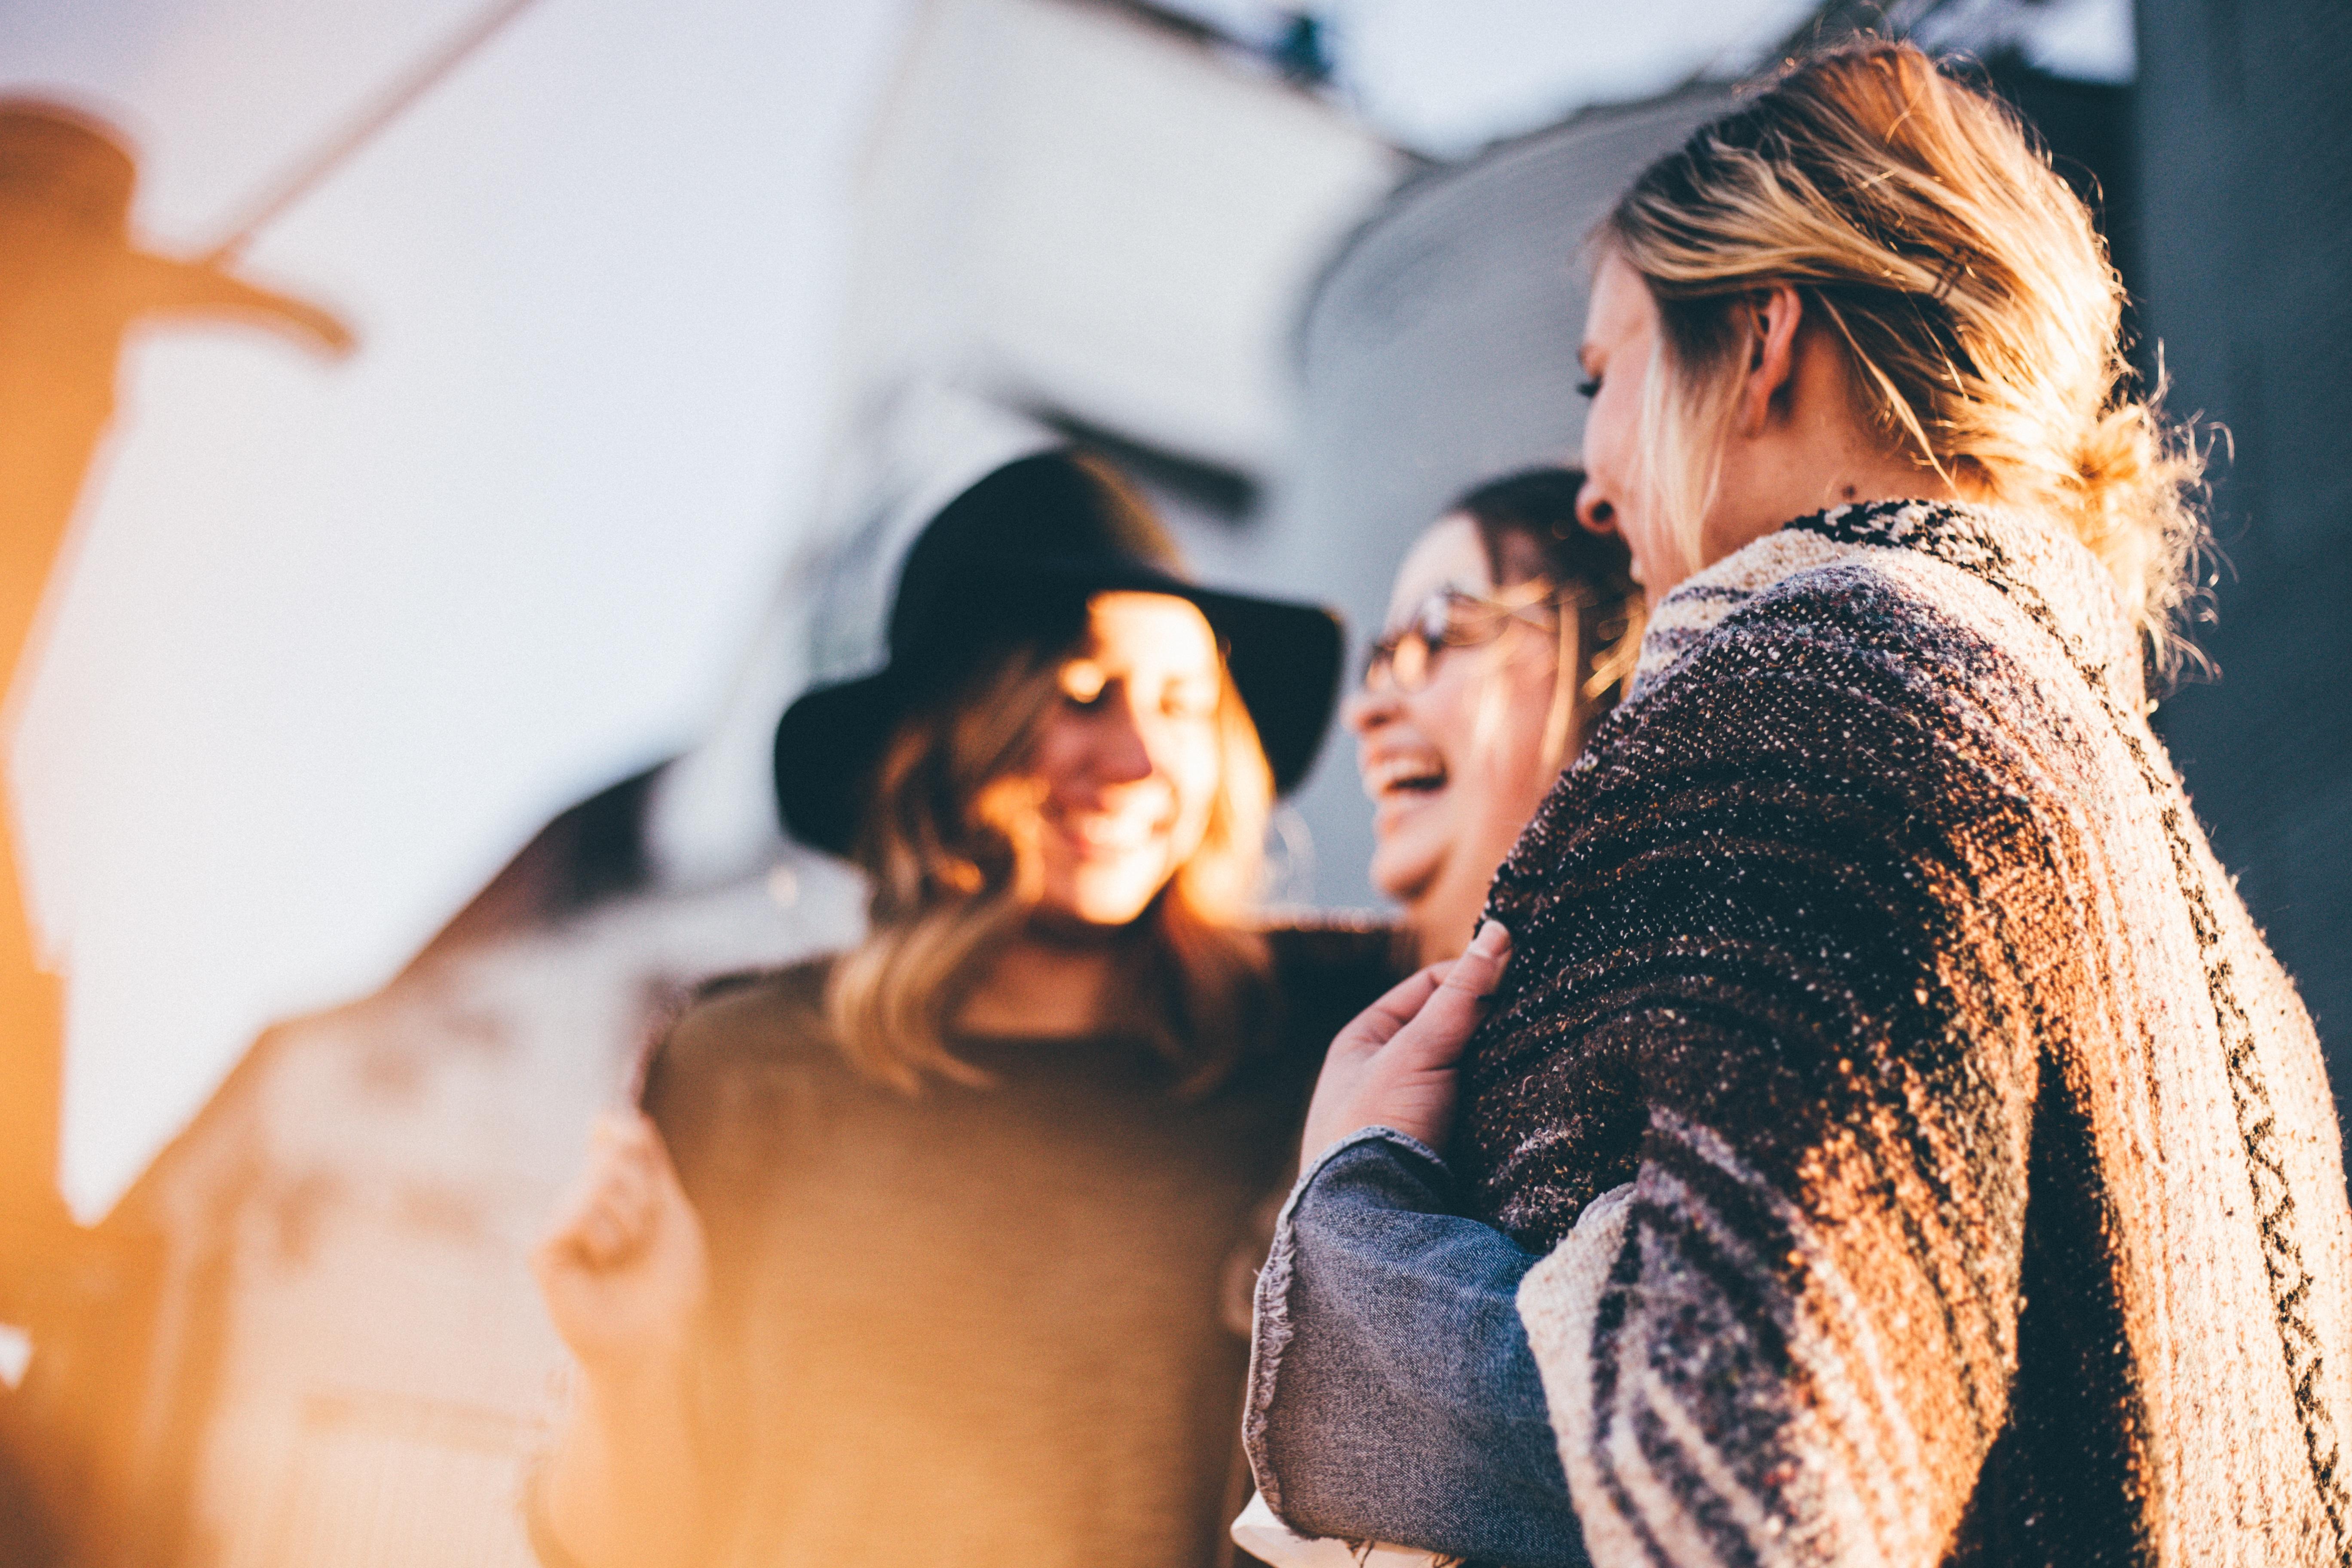 Image: three woman laughing